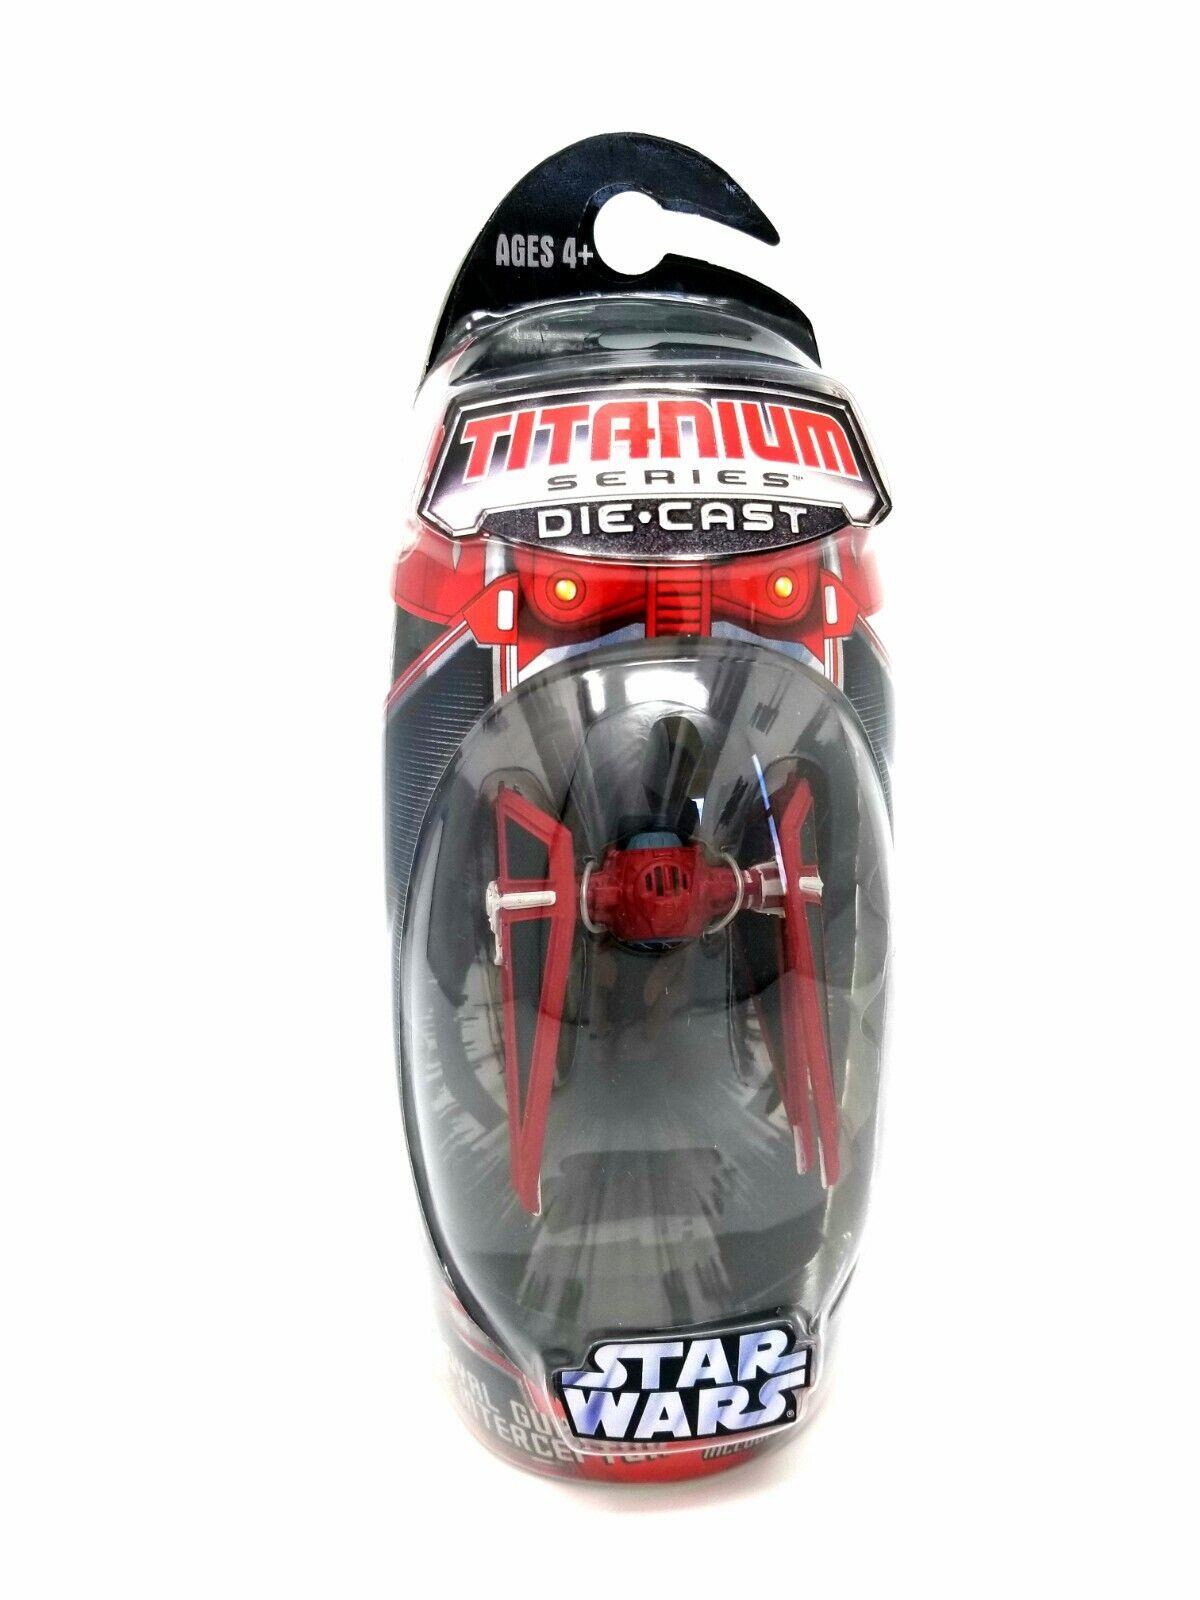 Star Wars Royal Guard Tie Interceptor Titanium Series Die-Cast MIB